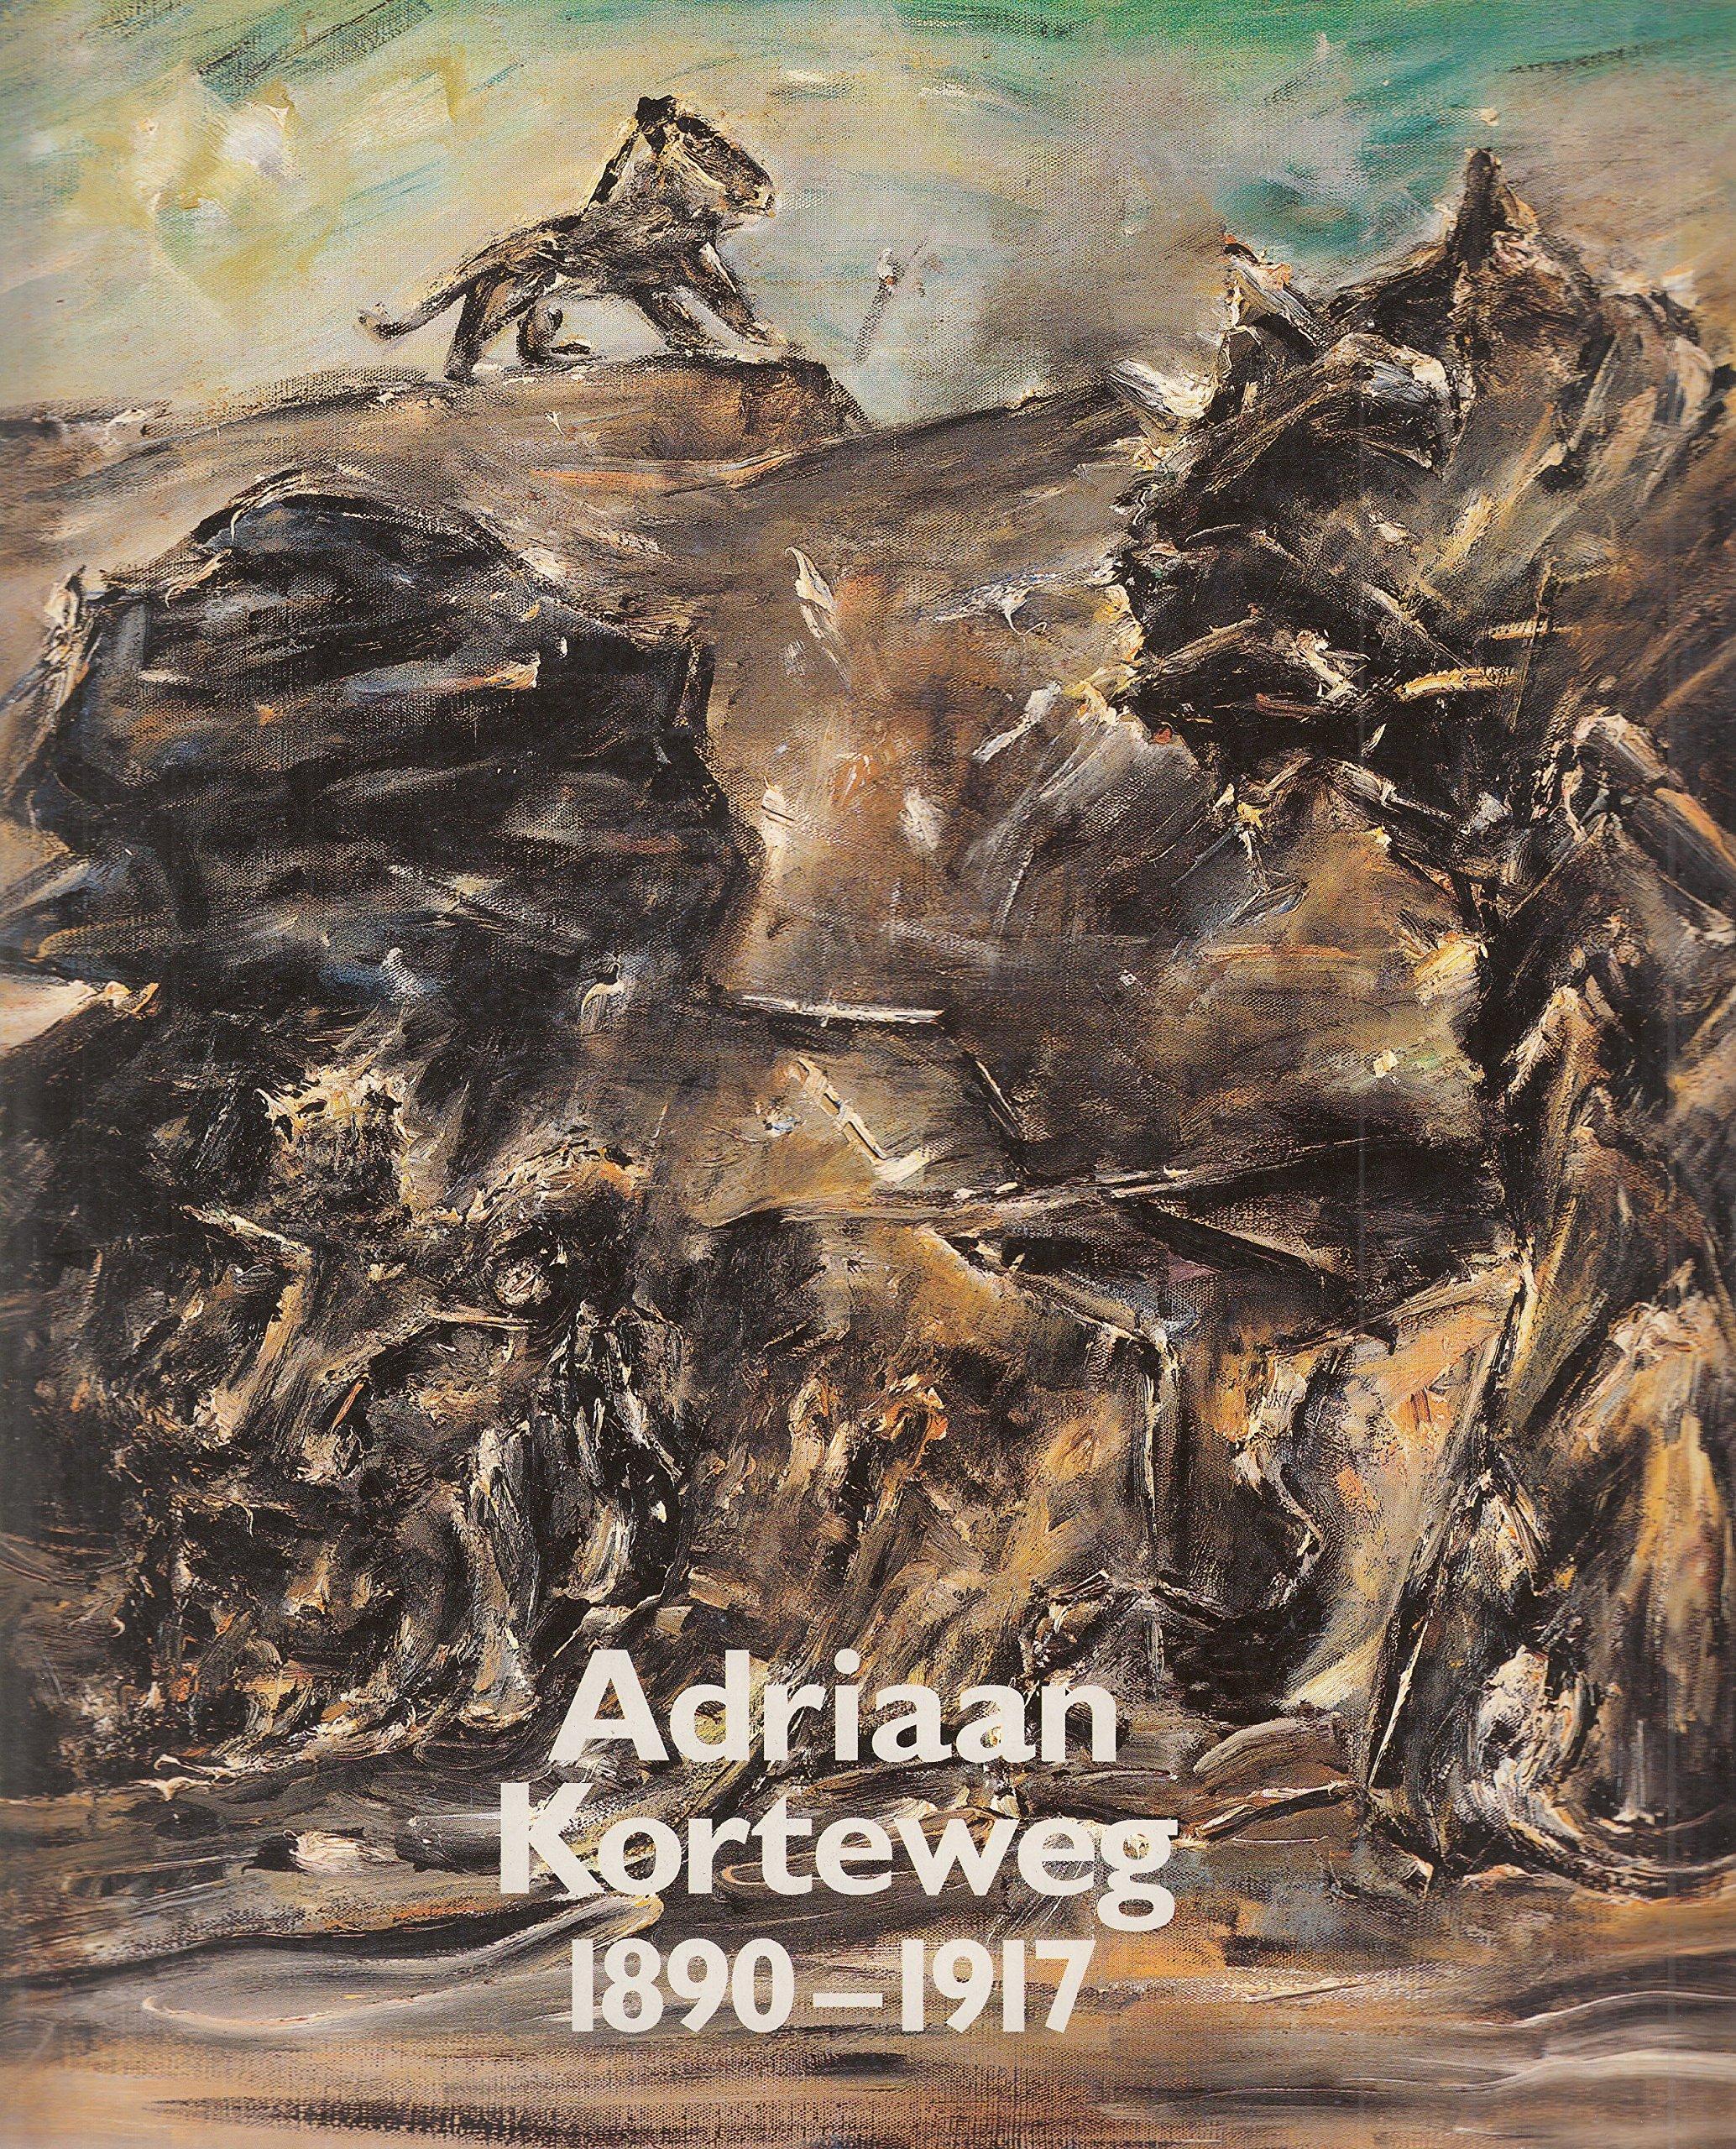 A. HOBERG - Adriaan Korteweg 1890-1917